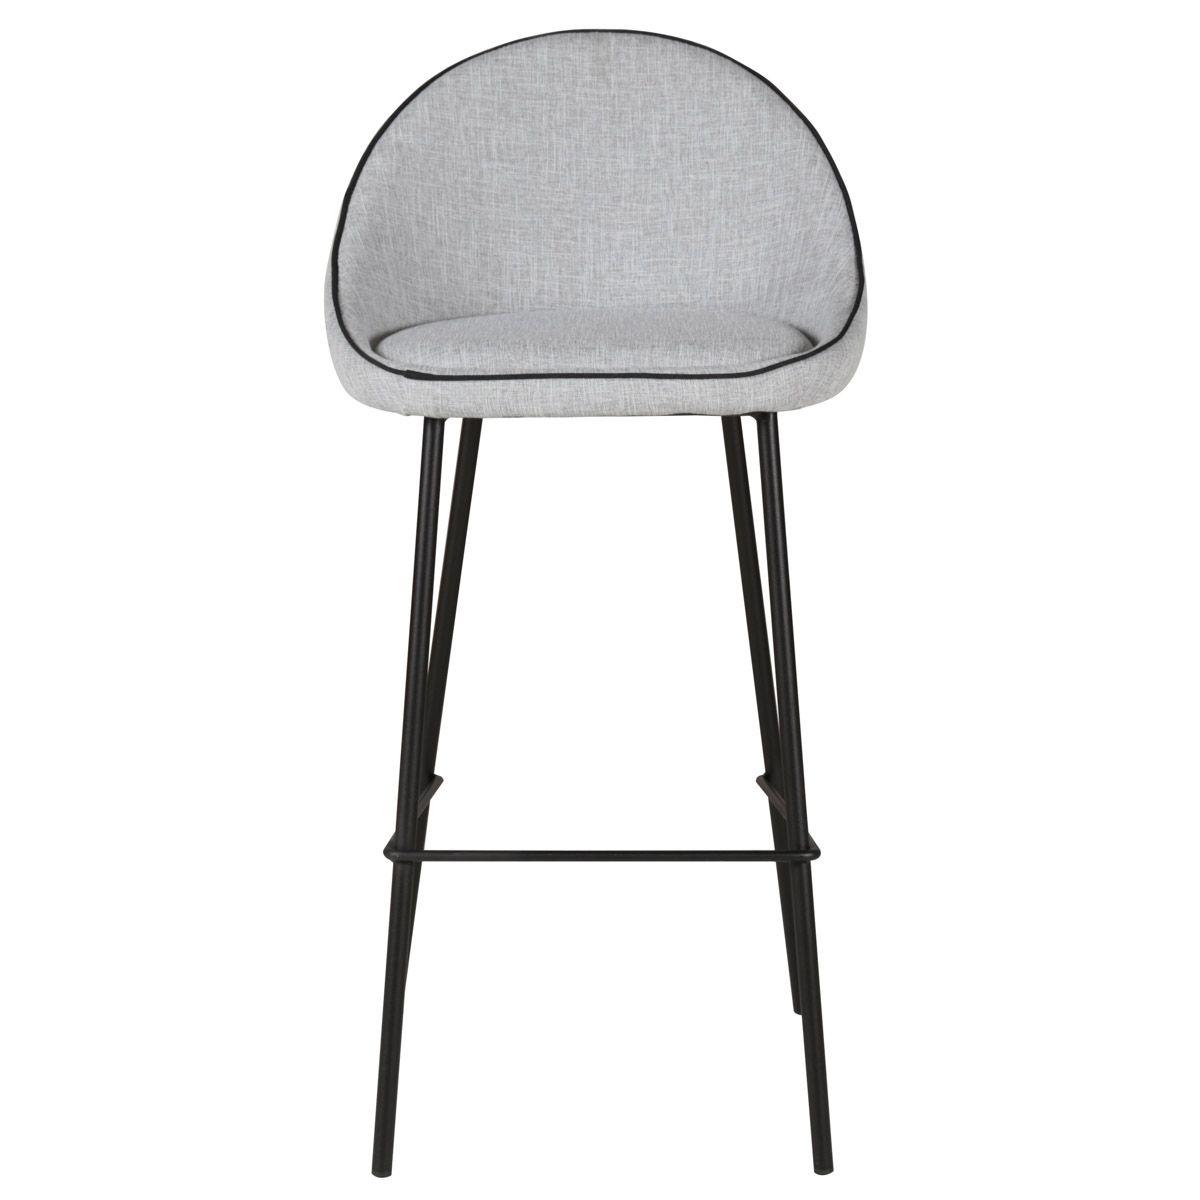 Chaise de bar tissu gris clair et pieds métal Maya